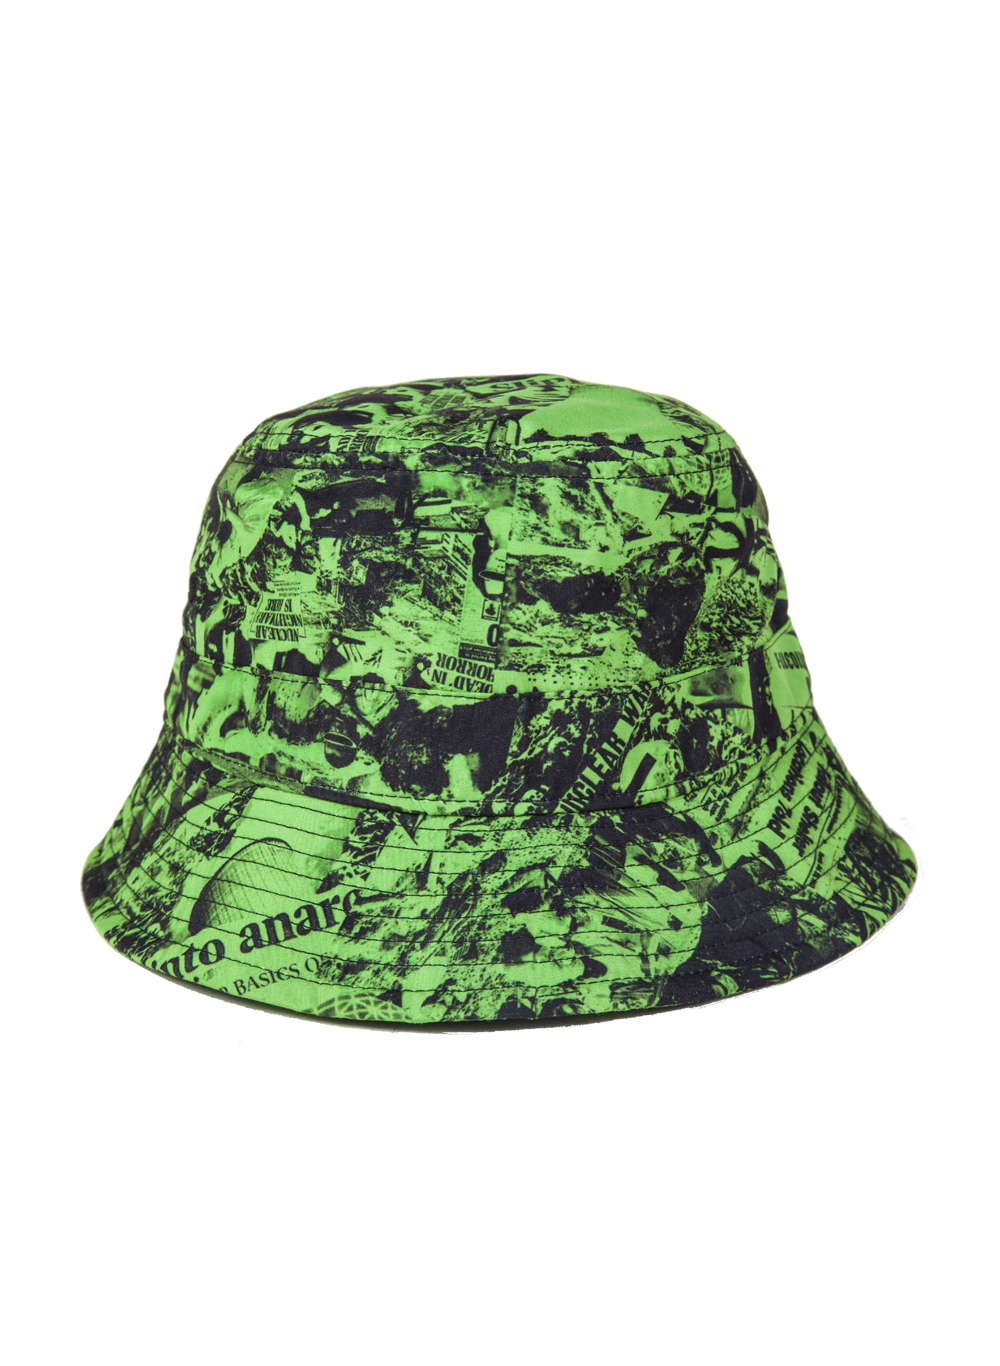 New Panic Reversible Bucket Hat